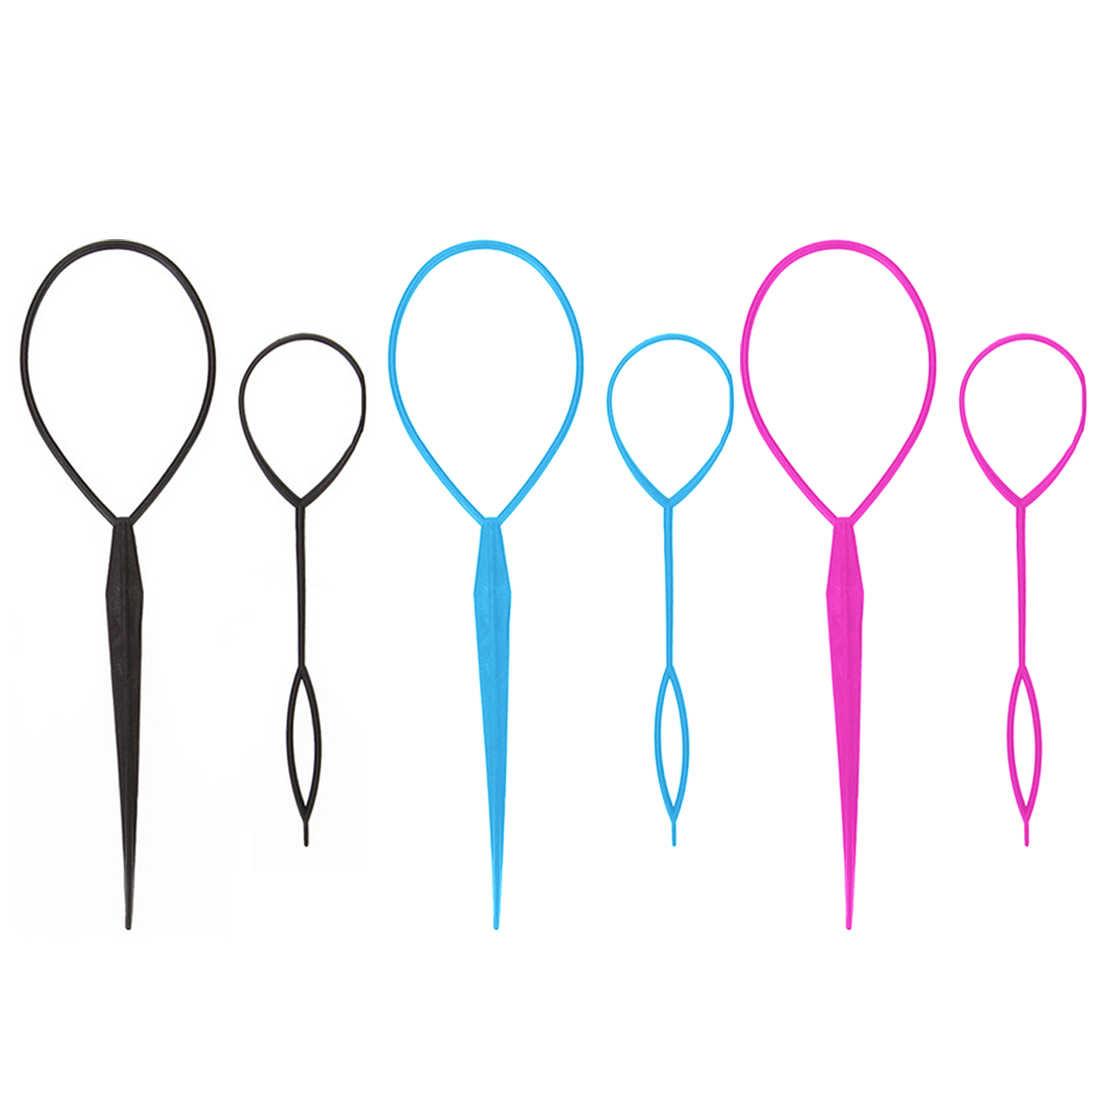 Straight Hair Needle Ponytail Hair Braider Creator Loop Styling Tail Clip Hair Braid Maker Styling Hairdressing DIY Tools